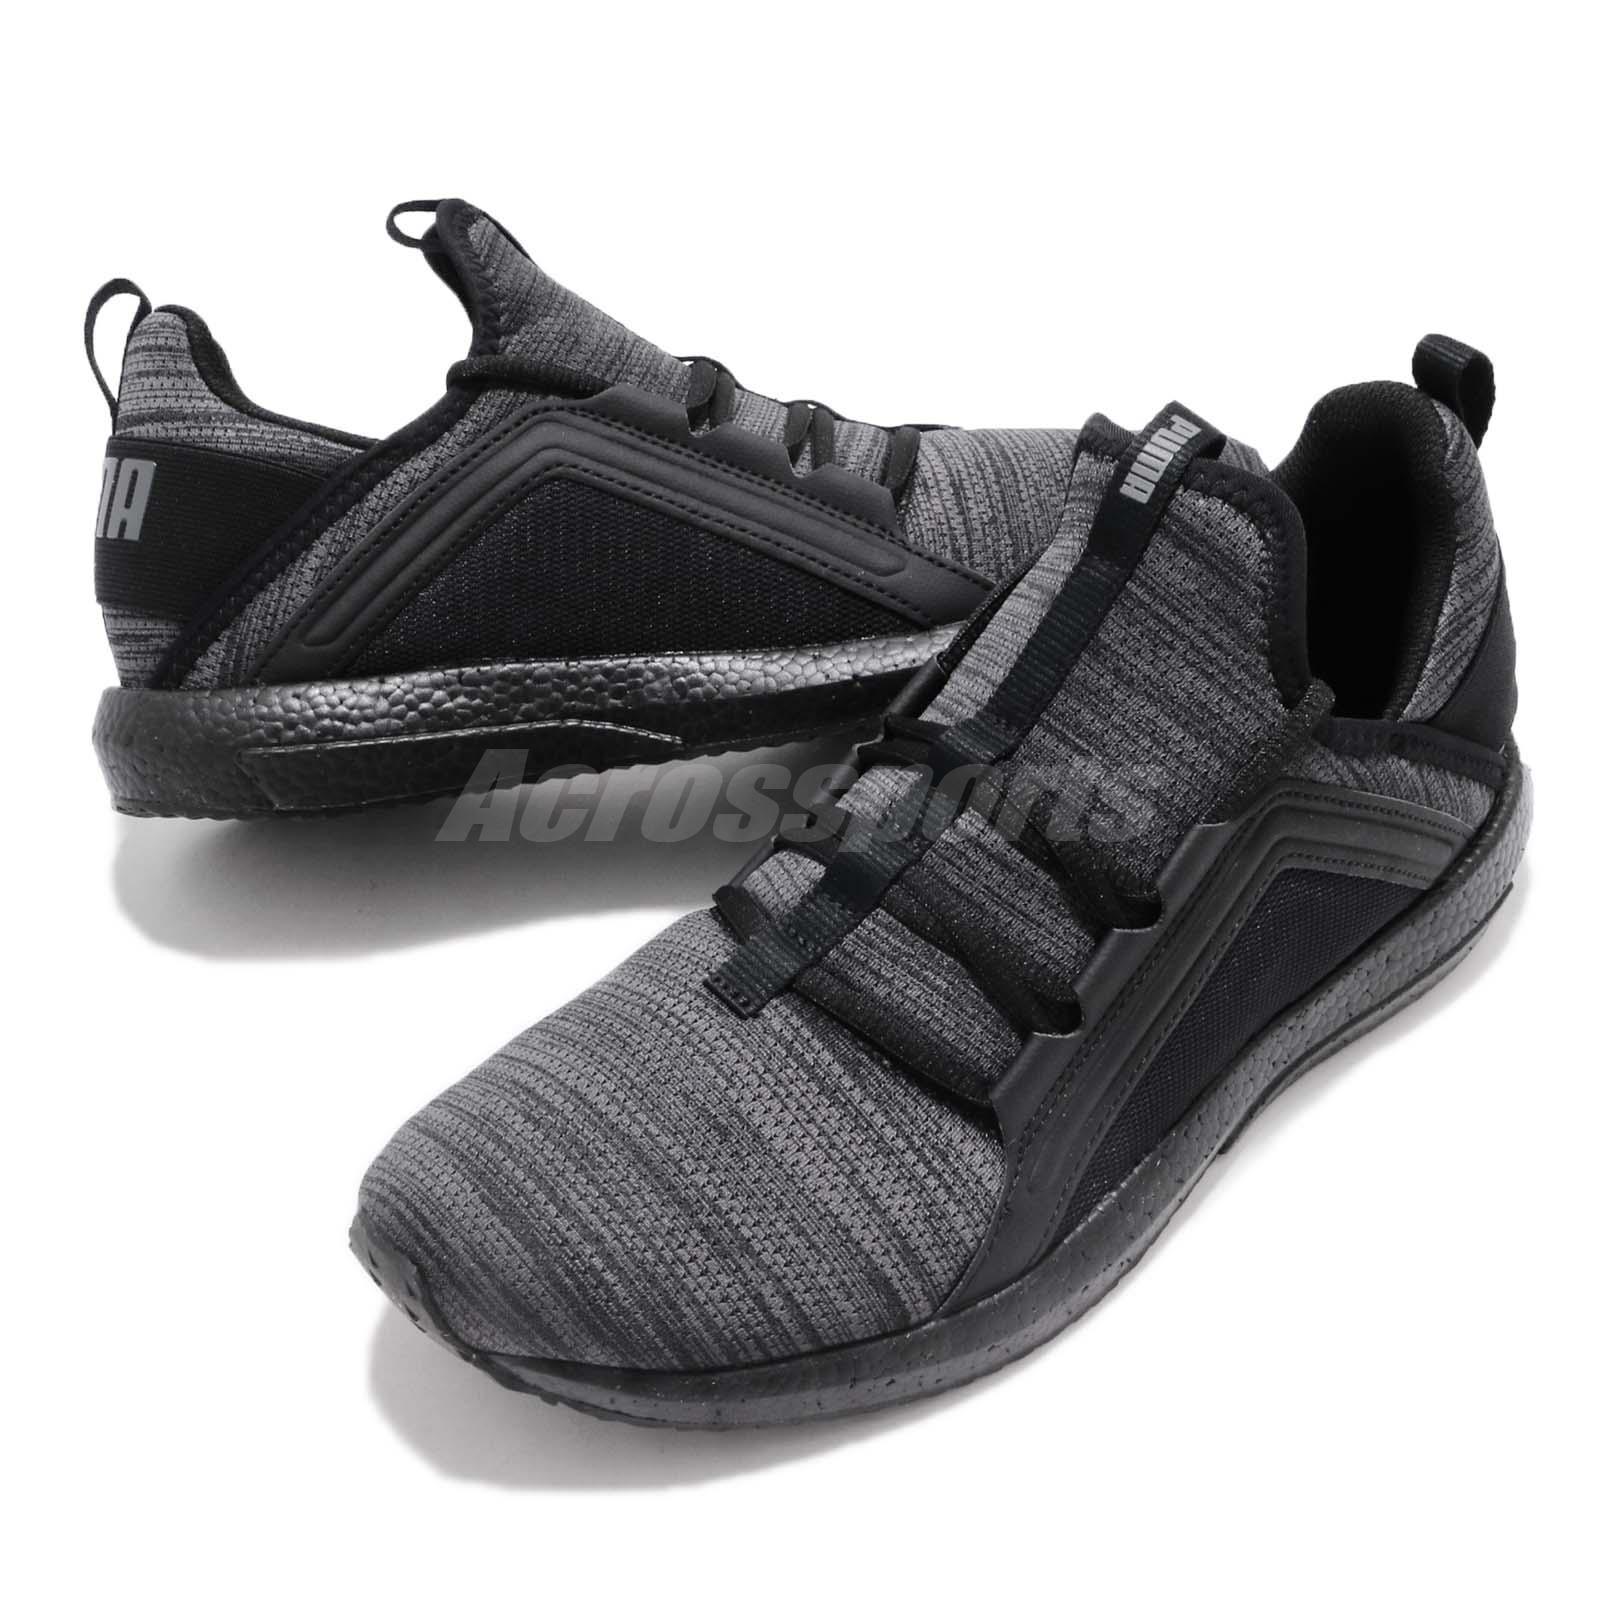 30fd36f7dd3 Puma Mega NRGY Heather Knit Black Grey Men Running Shoes Sneakers ...